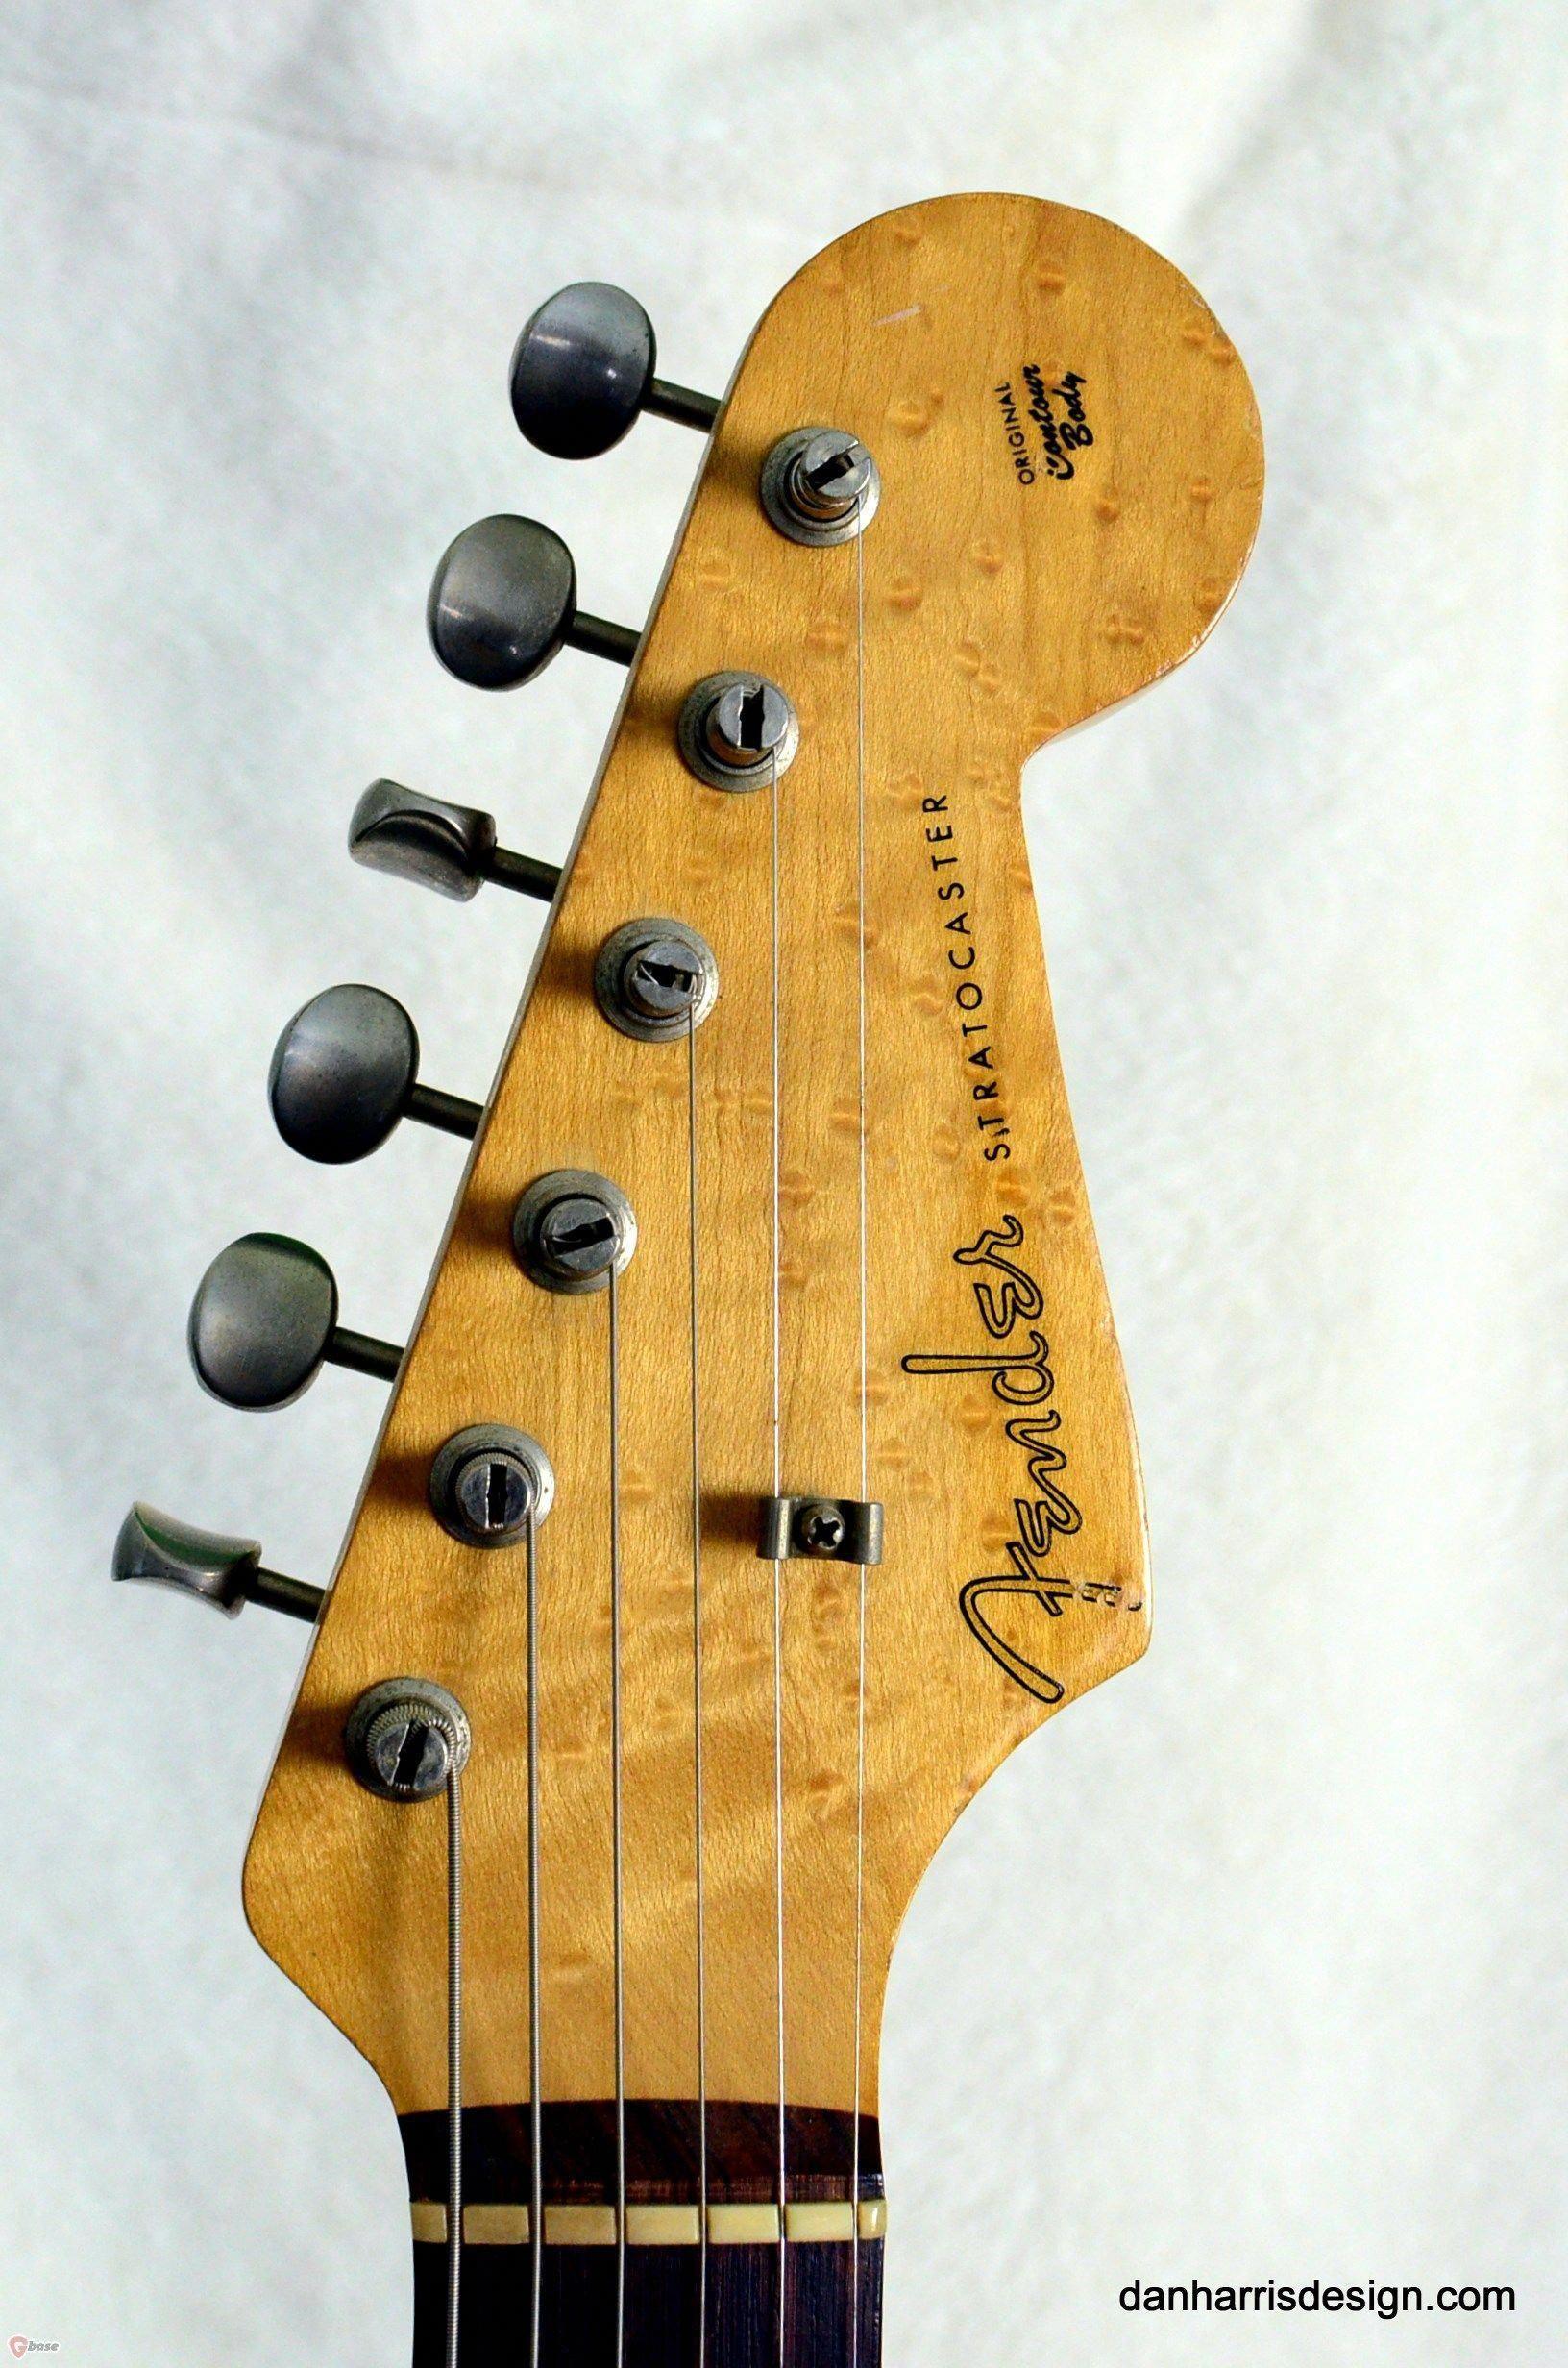 14 Awesome Fender Guitars Calendar 2019 Fender Guitar Wall Art Guitarsecret Guitarpedal Fenderguitars Fender Guitars Guitar Fender Stratocaster